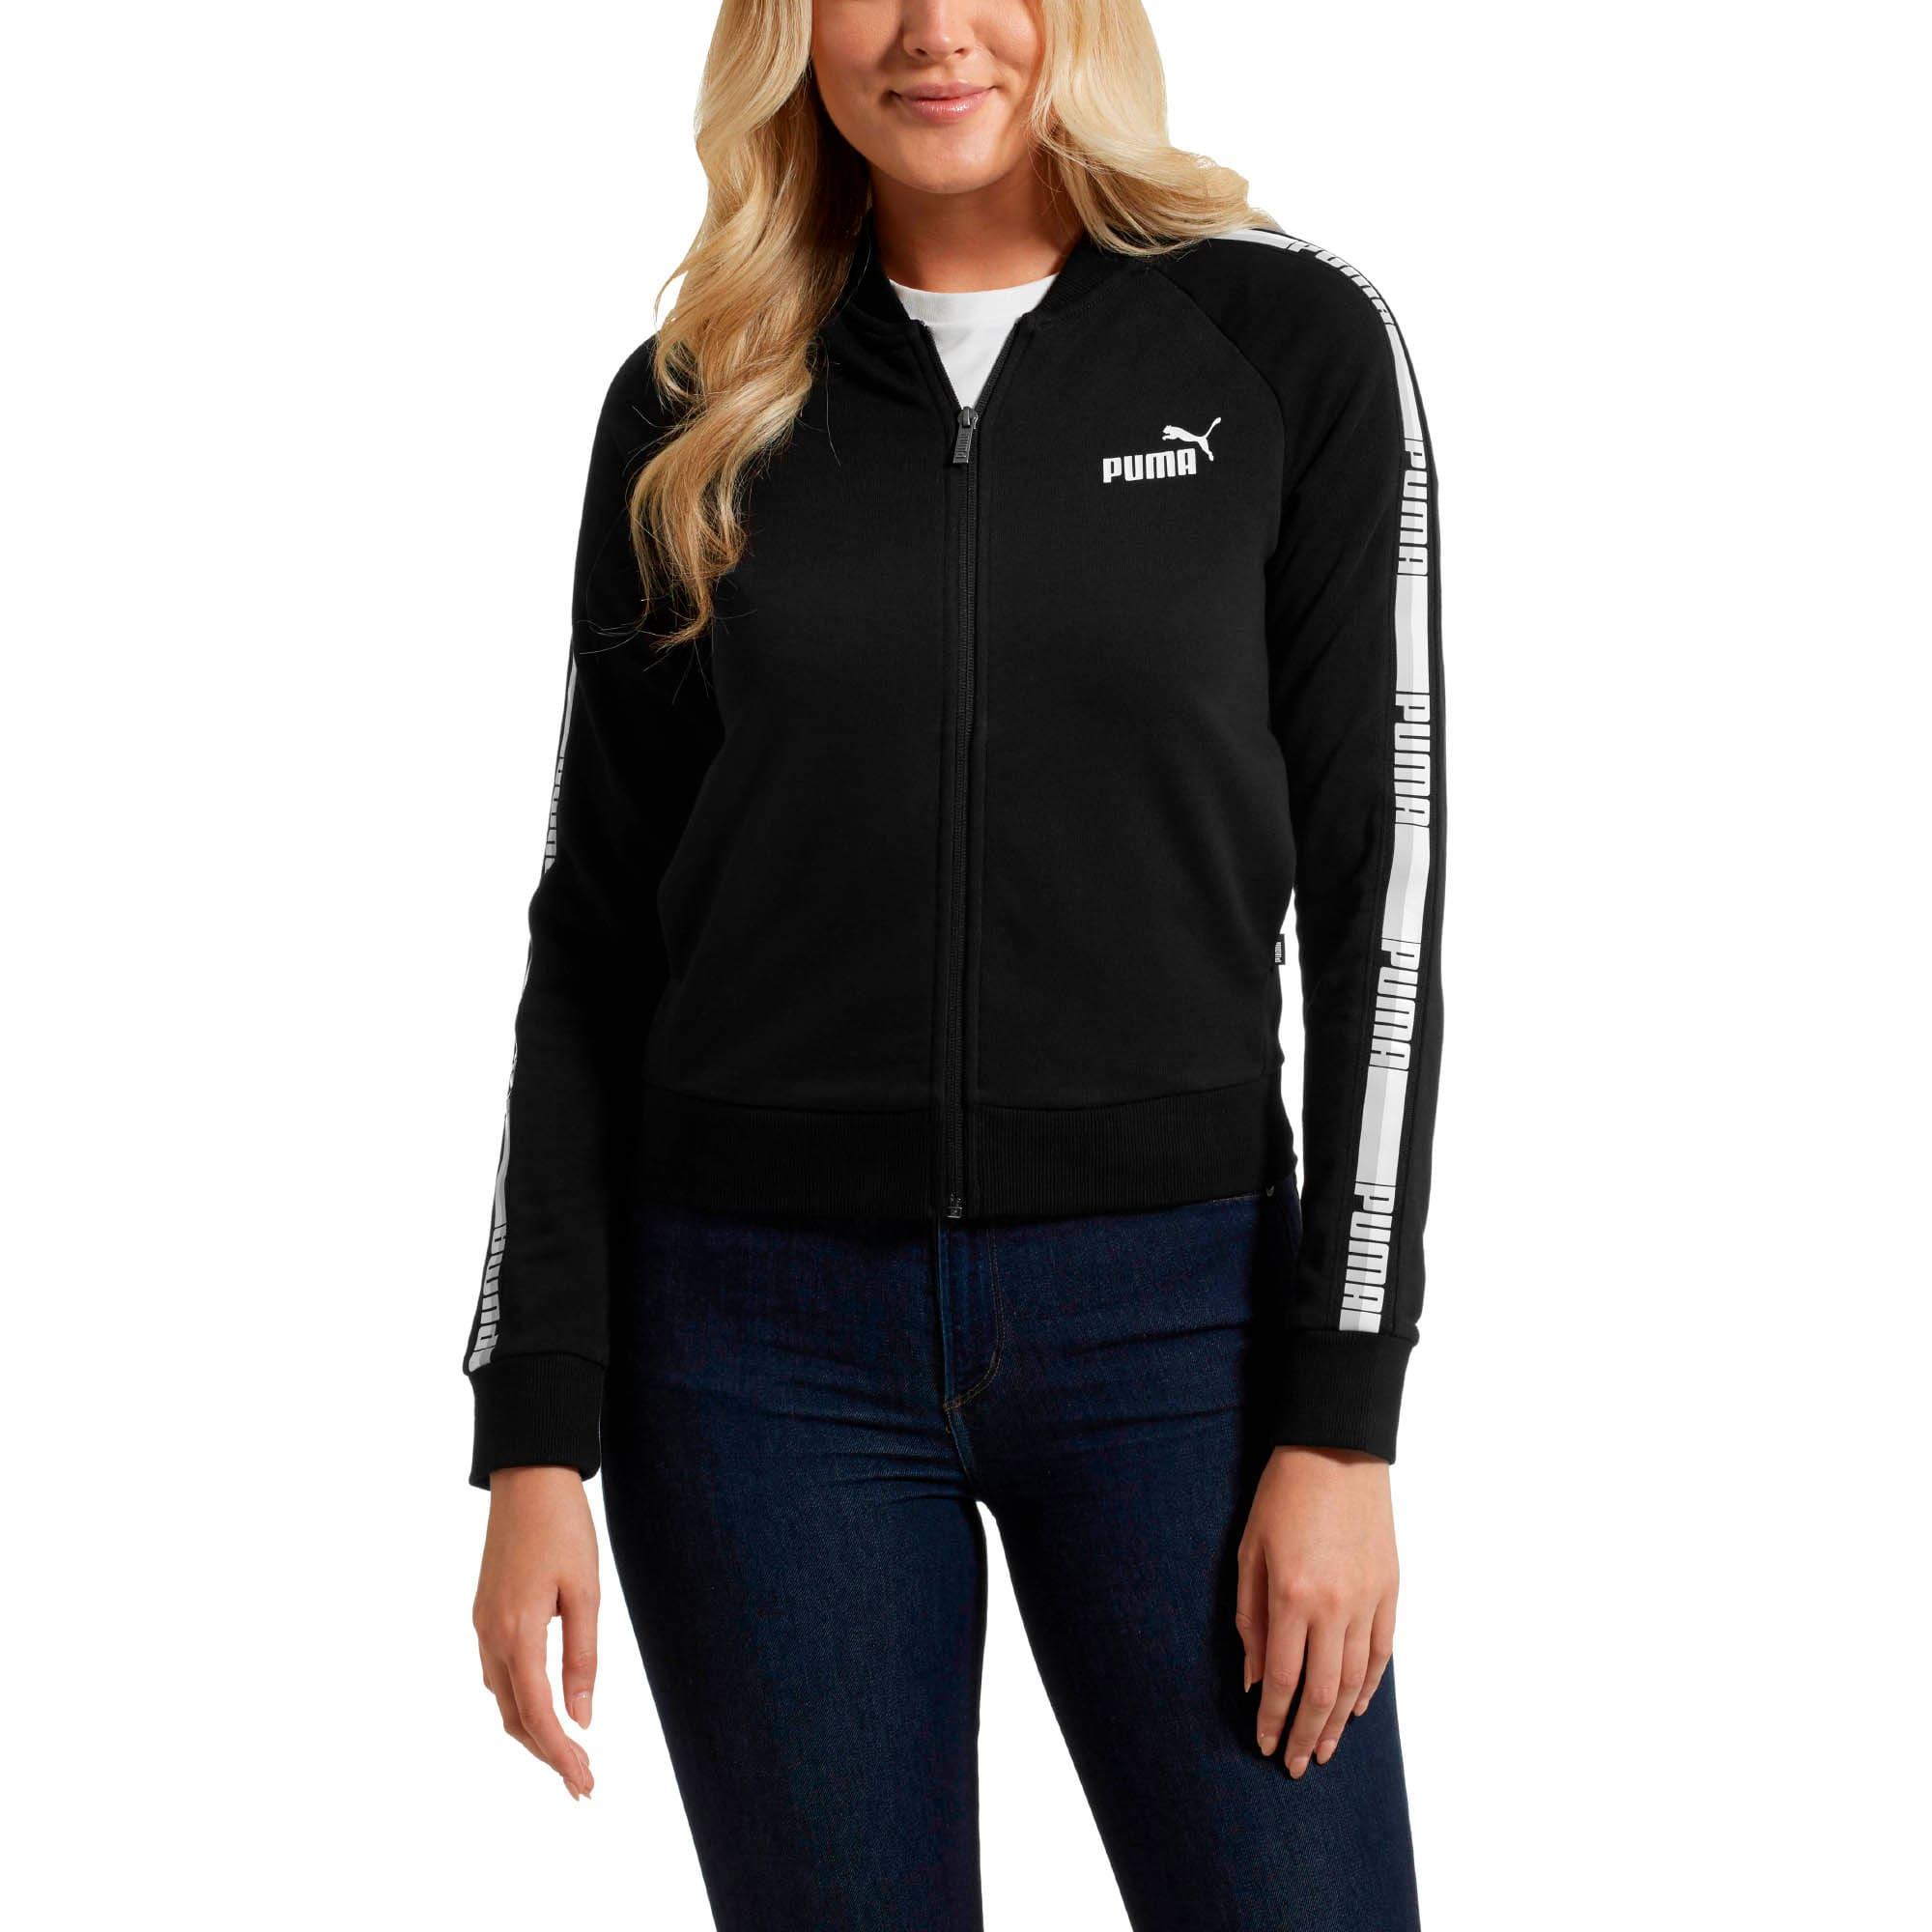 Thumbnail 2 of Tape Full Zip Women's Track Jacket, Cotton Black, medium